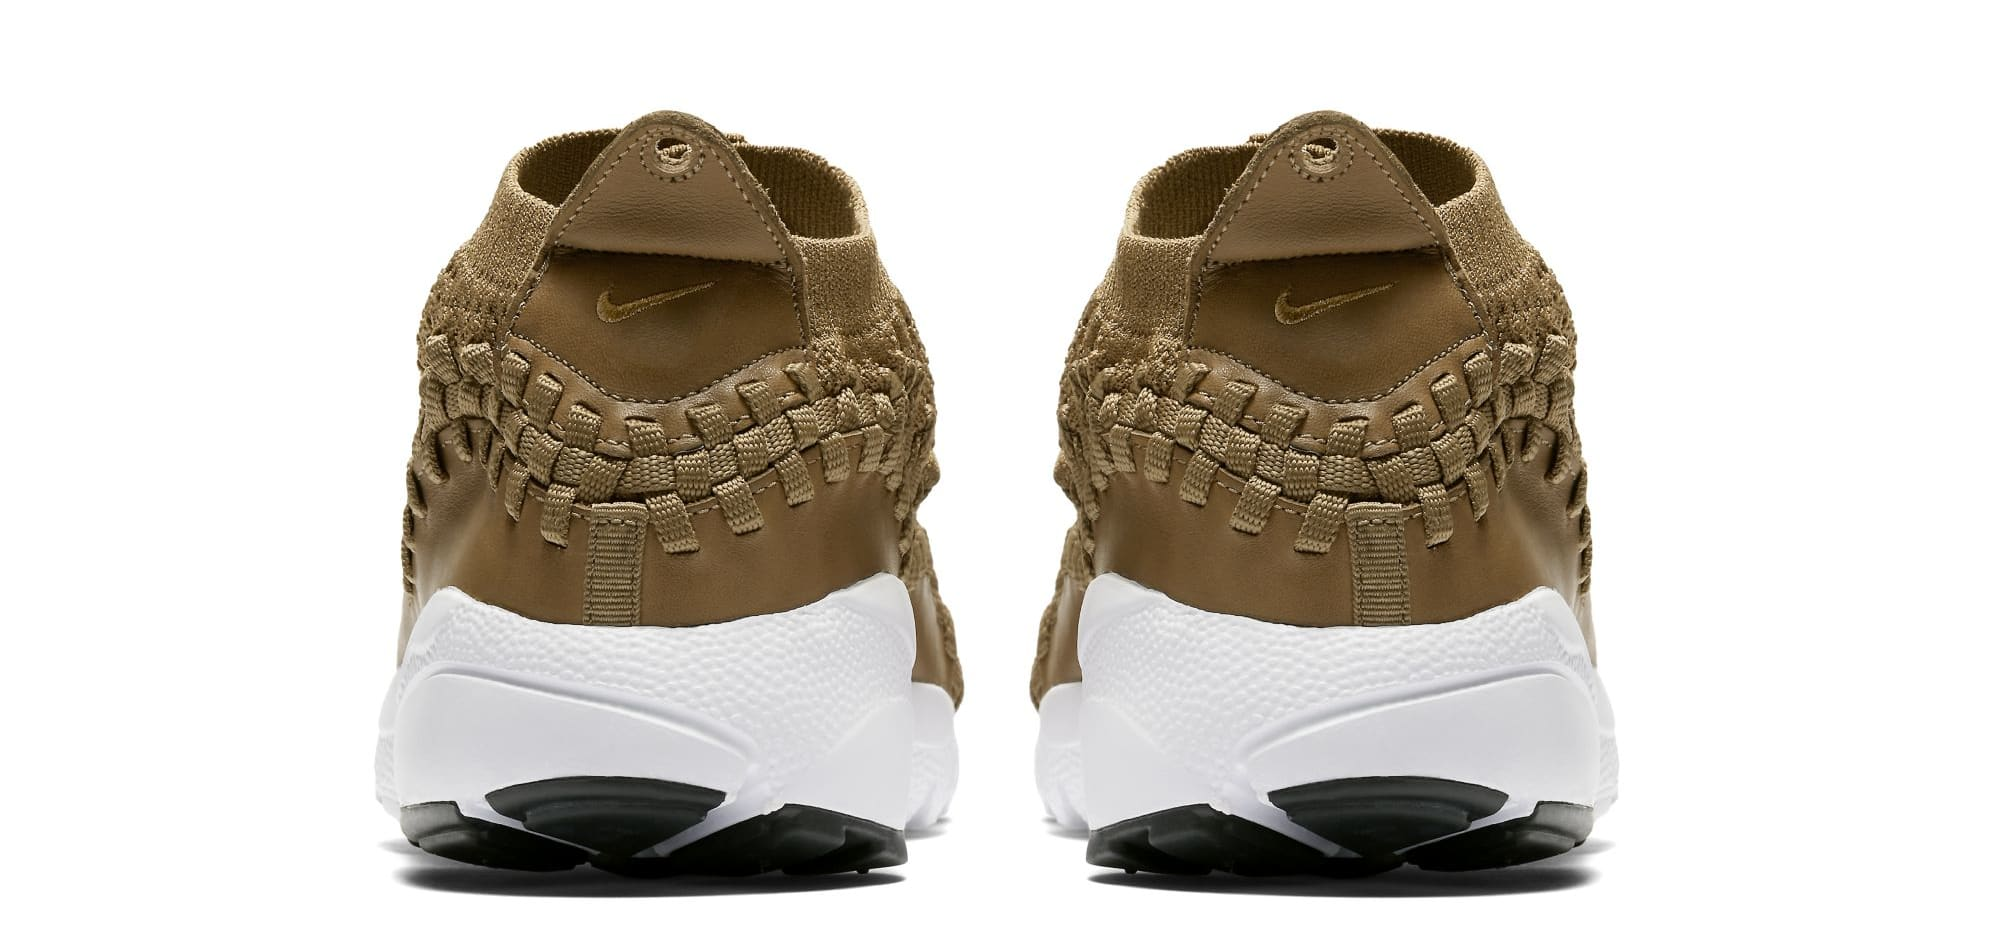 Nike Footscape Woven Chukka Flyknit 'Golden Beige' AO5417-400 (Heel)